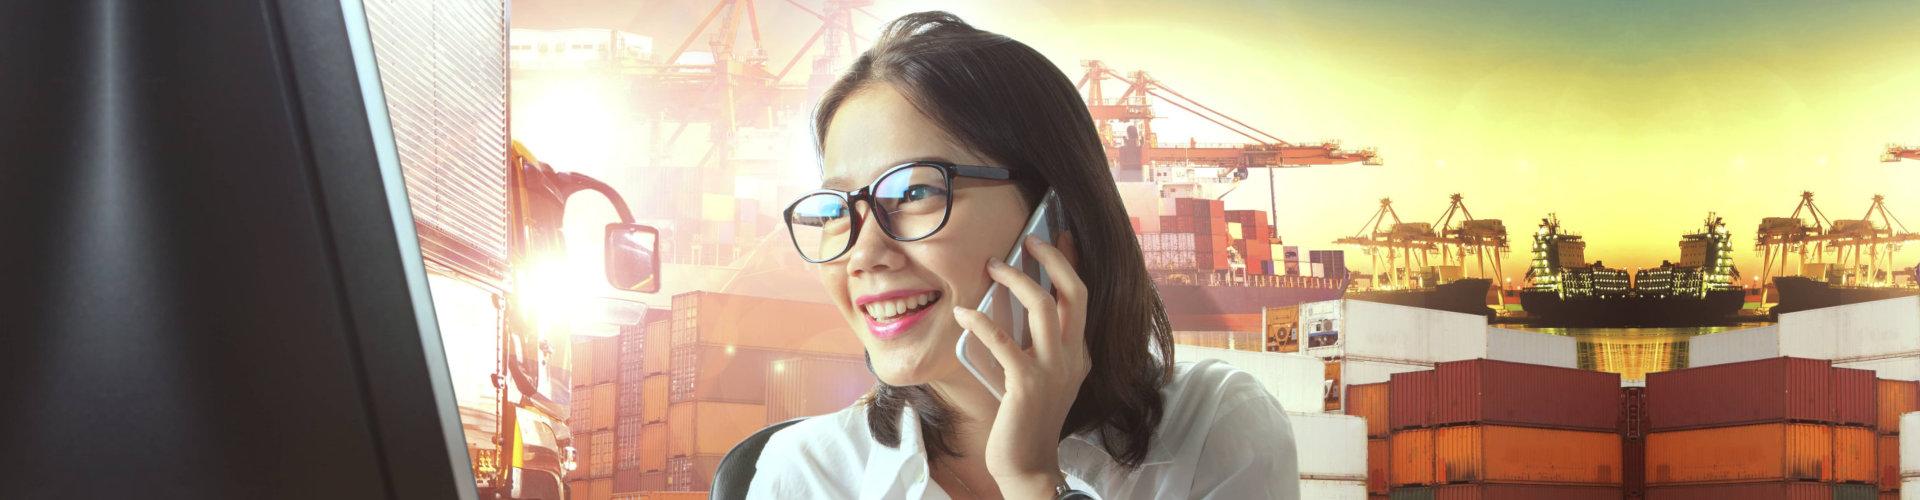 a woman answering calls